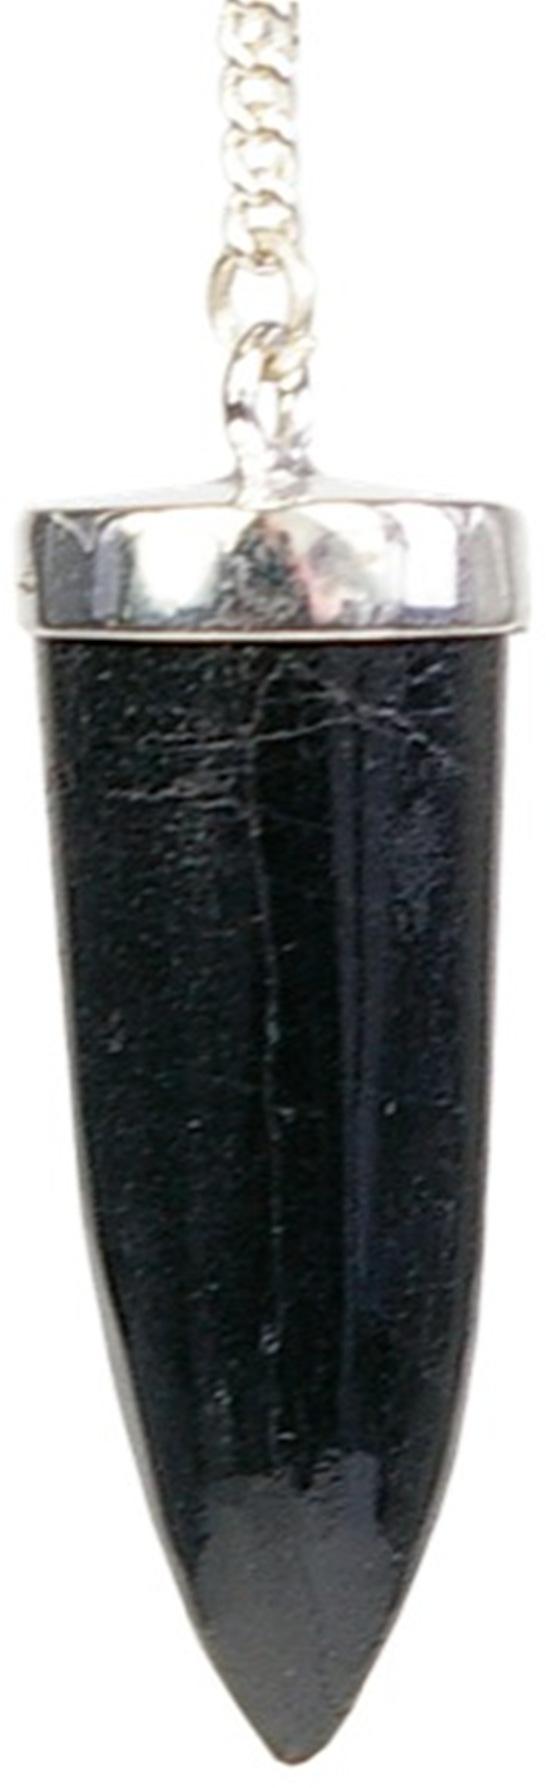 Pendule Tourmaline noire, pointe